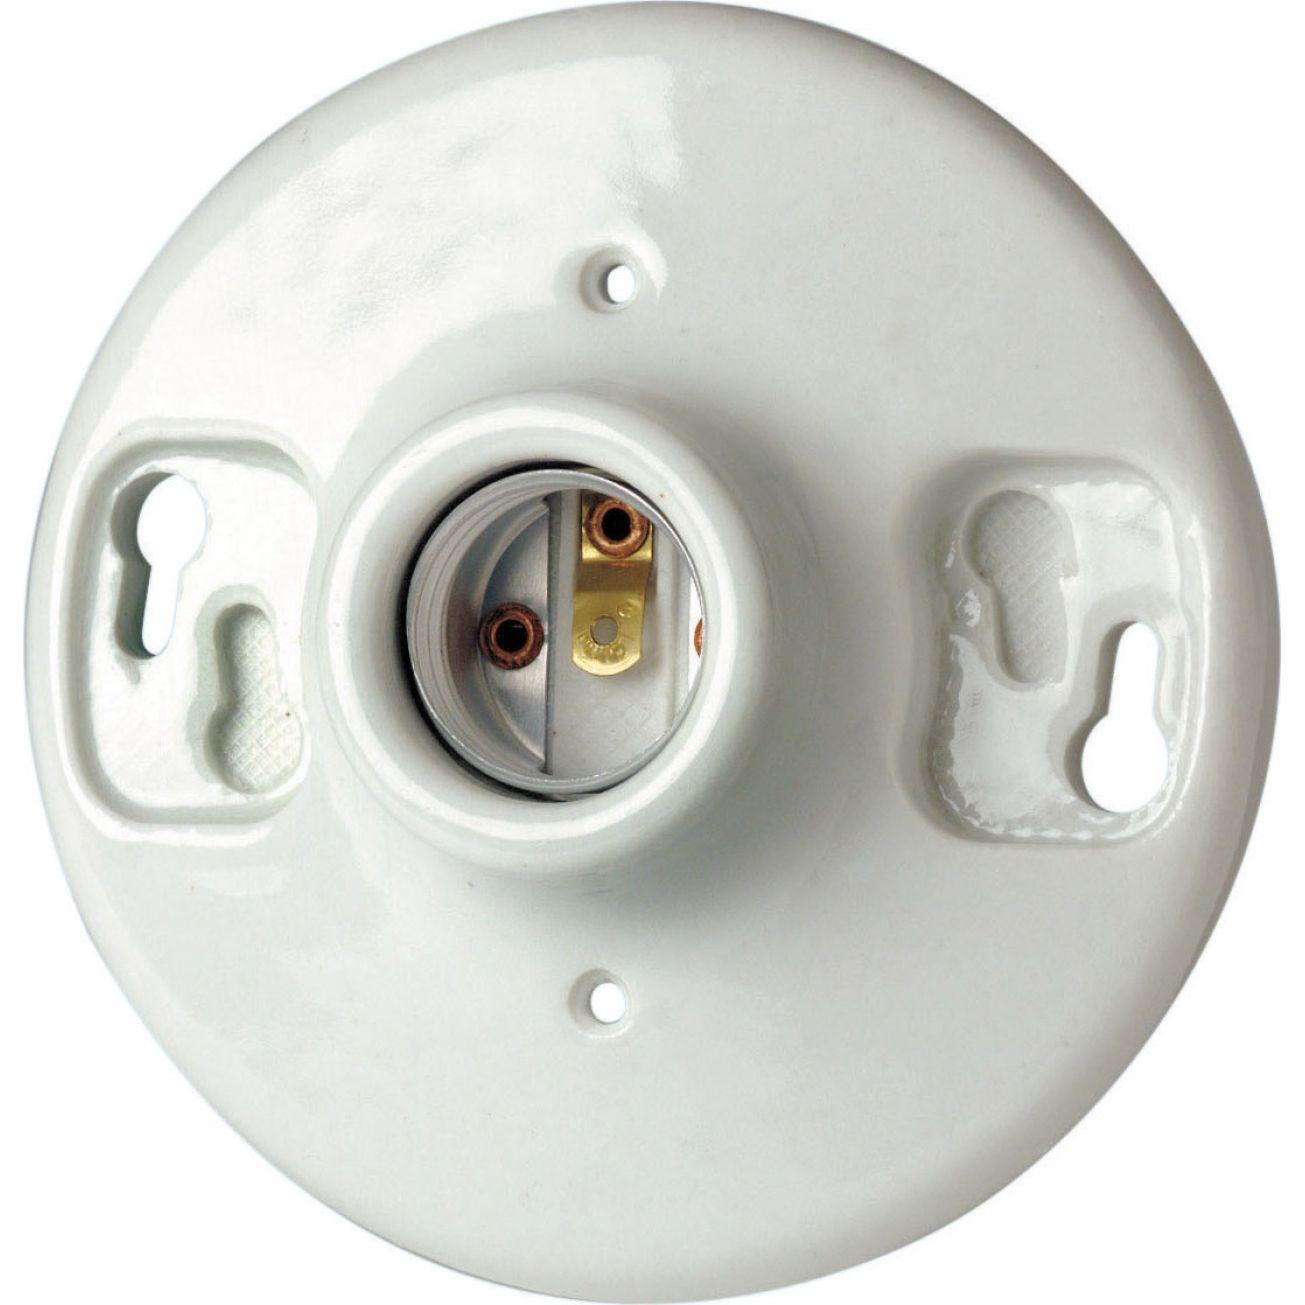 leviton keyless porcelain lampholder 09875 000 light sockets lampholders ace hardware [ 1305 x 1305 Pixel ]